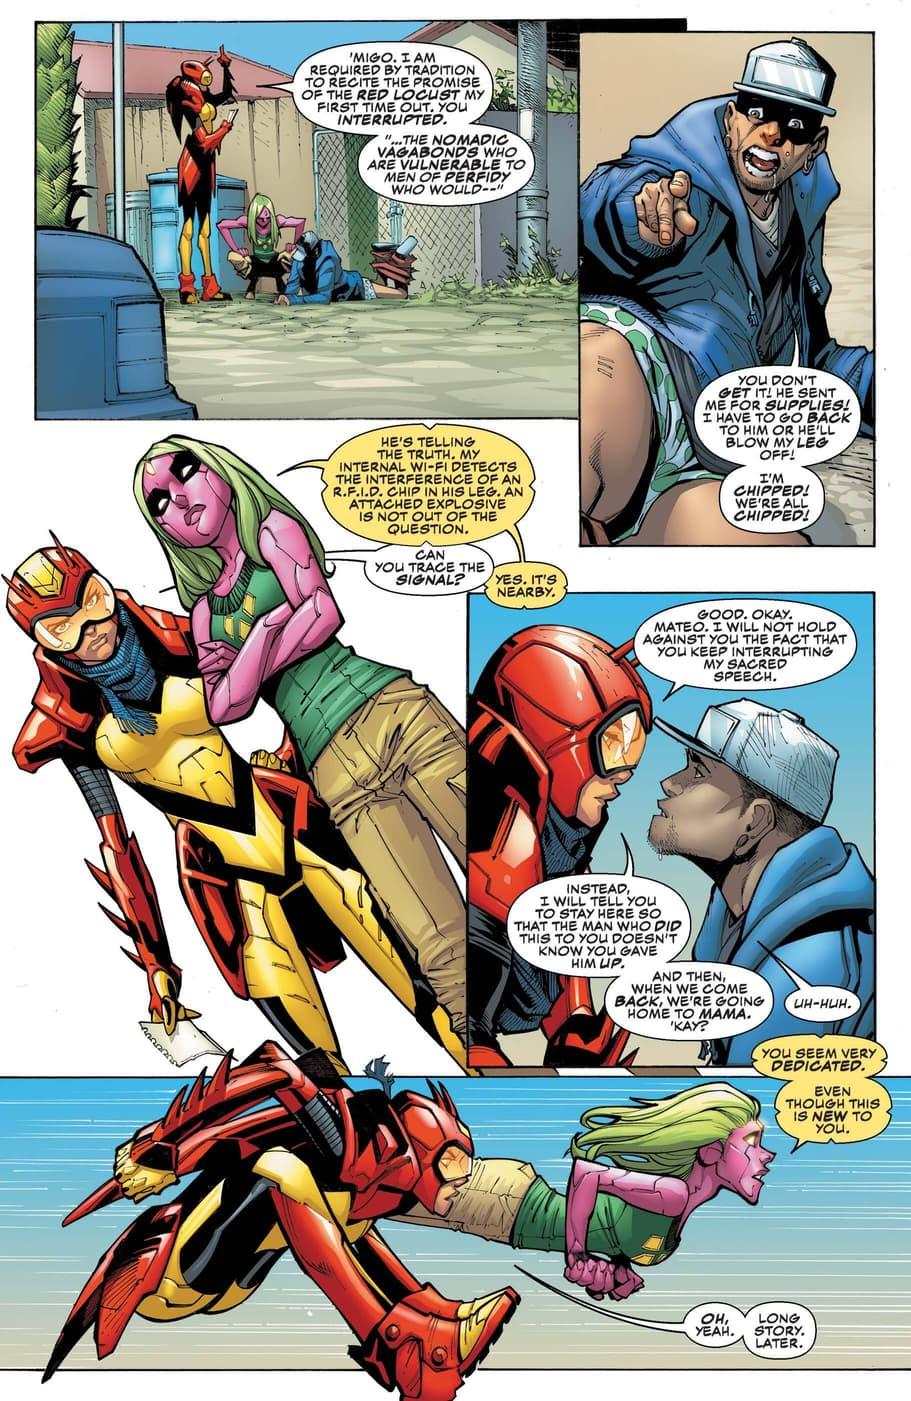 Red Locust (Fernanda Rodriguz) CHAMPIONS (2016) #9 Page 12